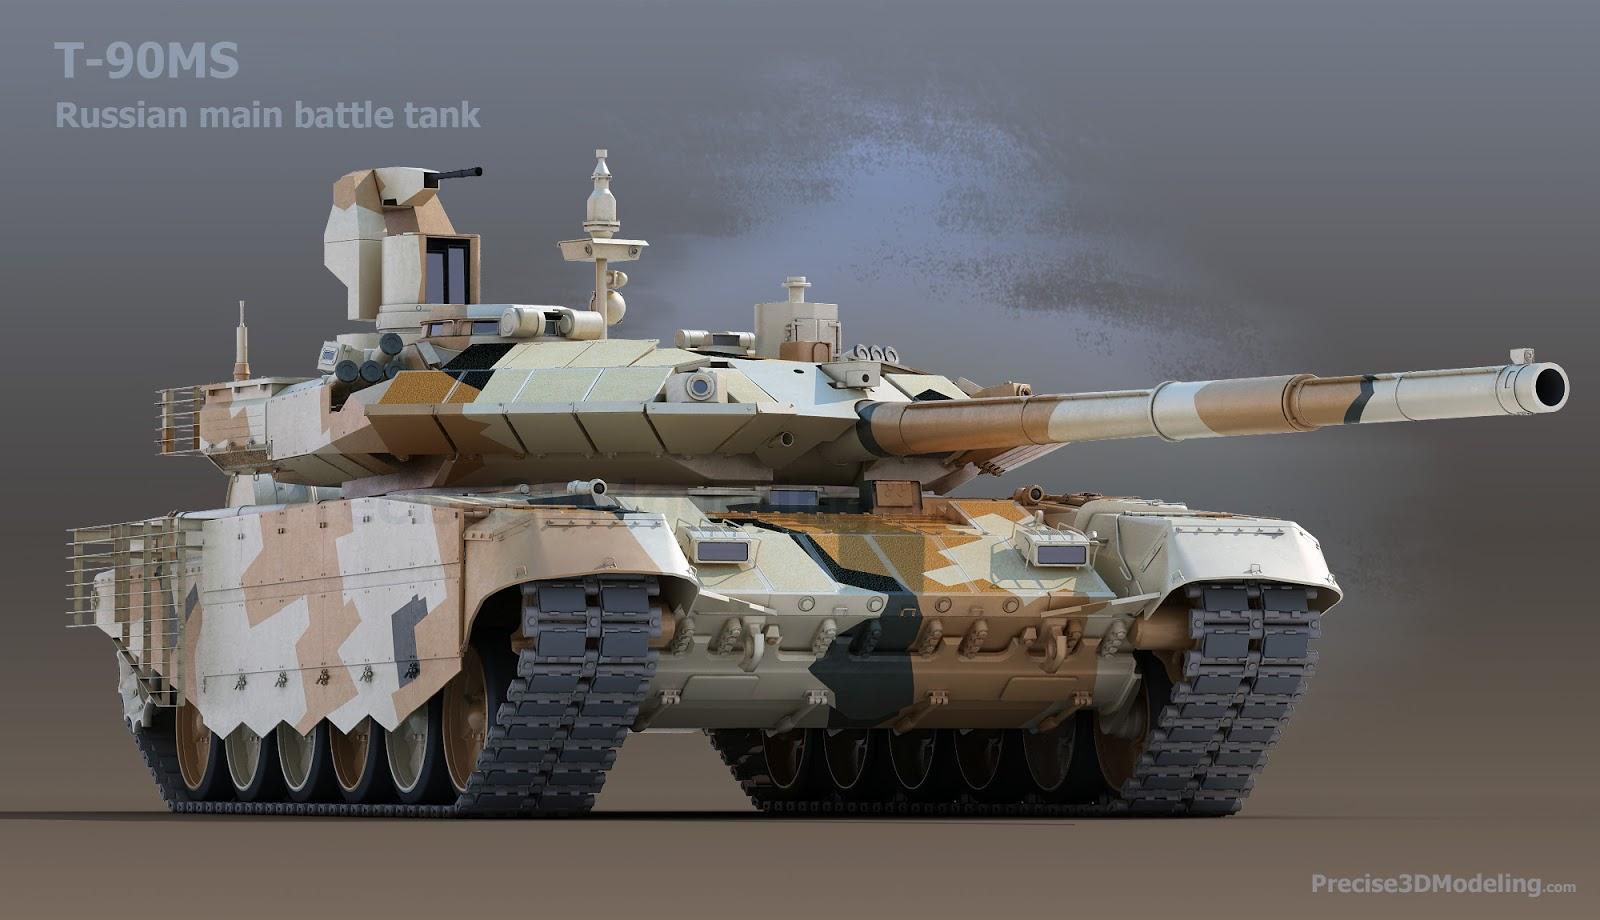 Vídeo: As capacidades do MBT russo Uralvagonzavod T-90S